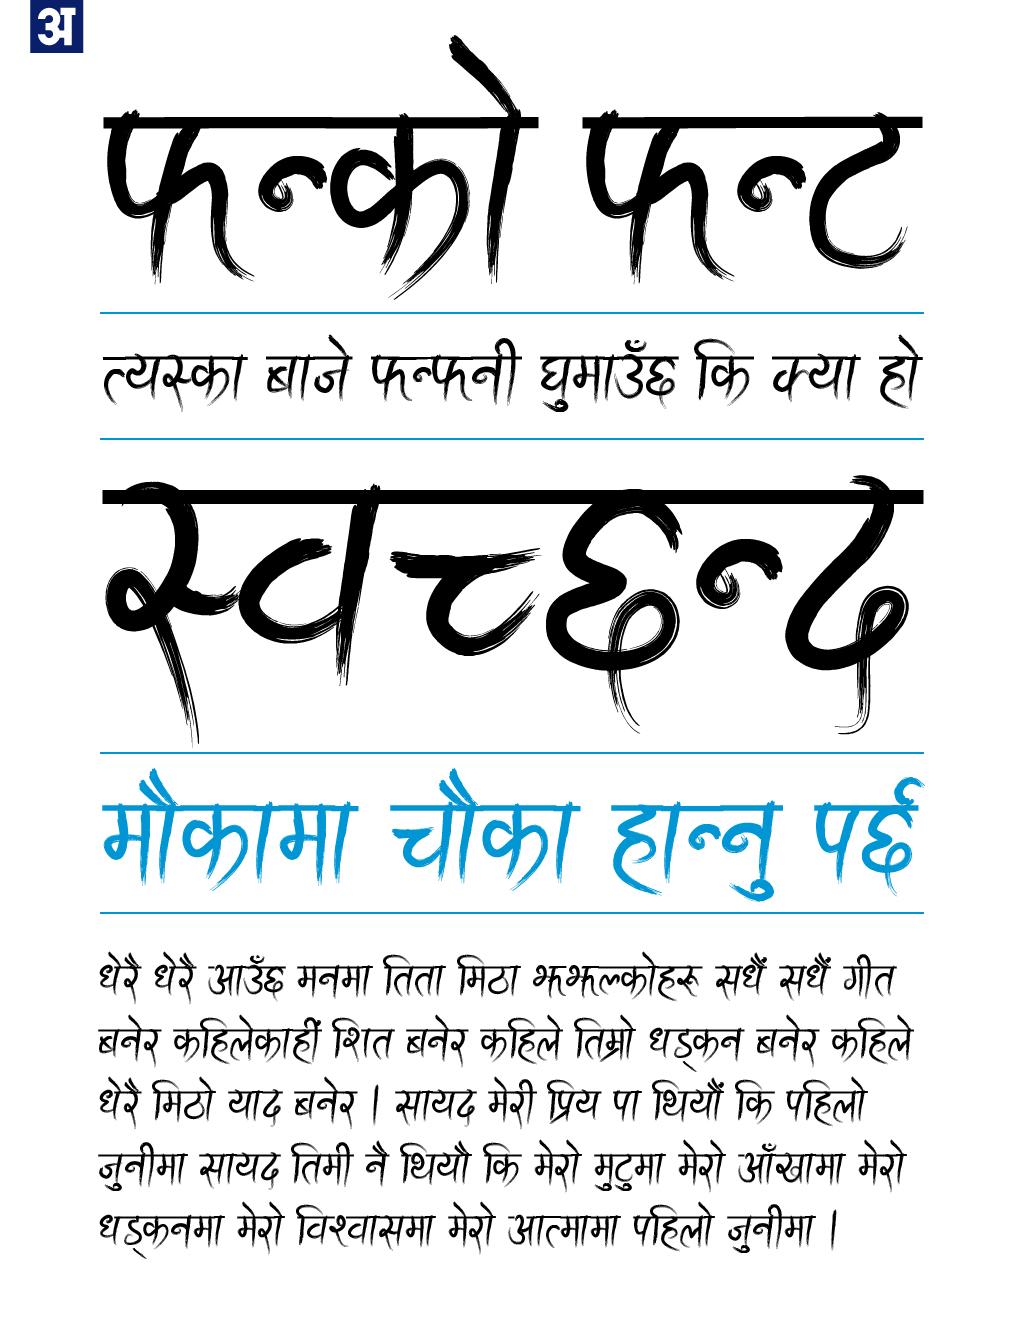 Devanagari Handwriting Ananda Fanko Br...